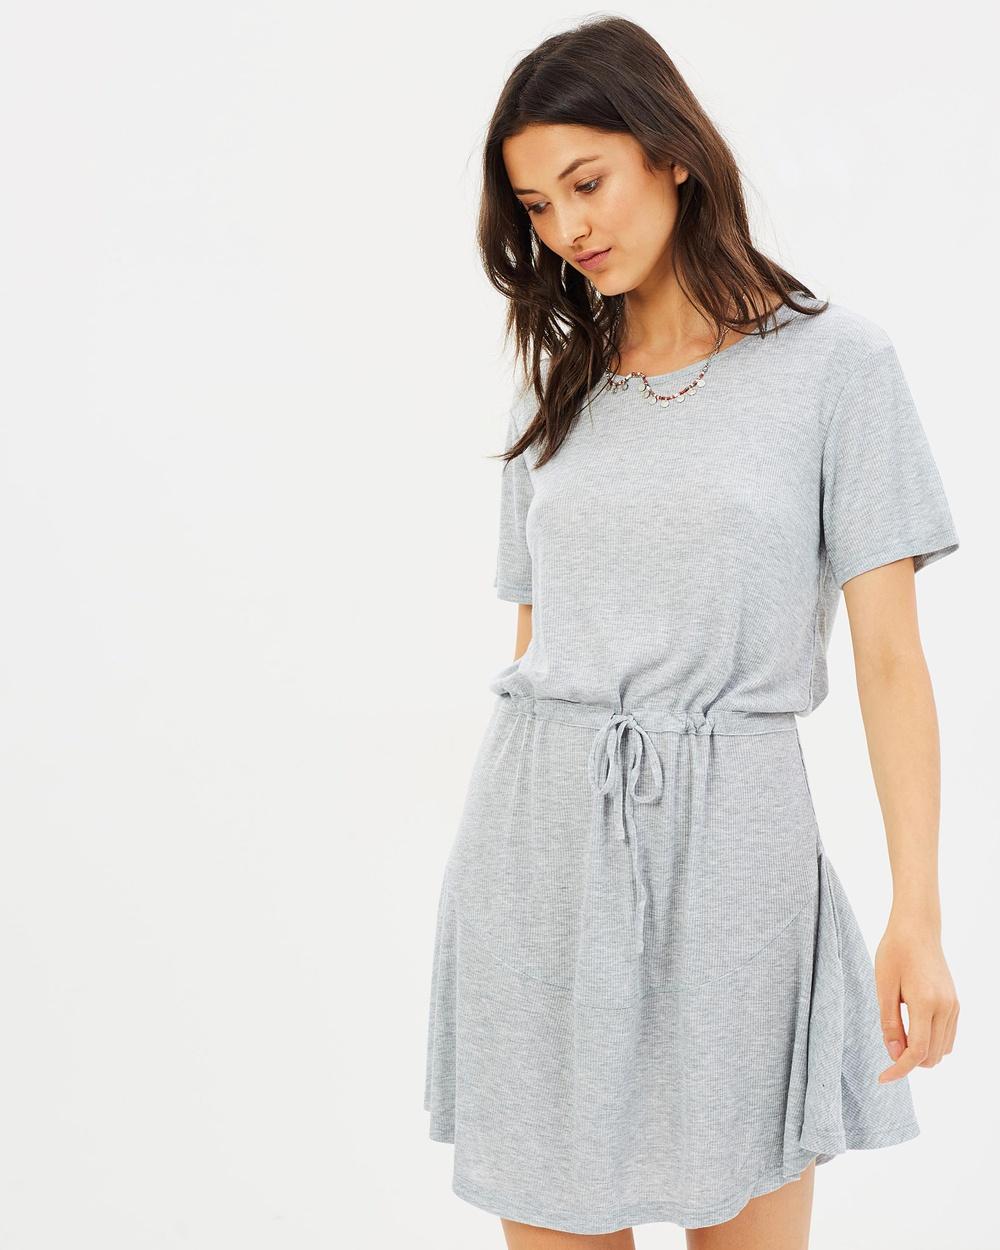 MINKPINK So Simple Drawstring Dress Dresses Grey Marle So Simple Drawstring Dress